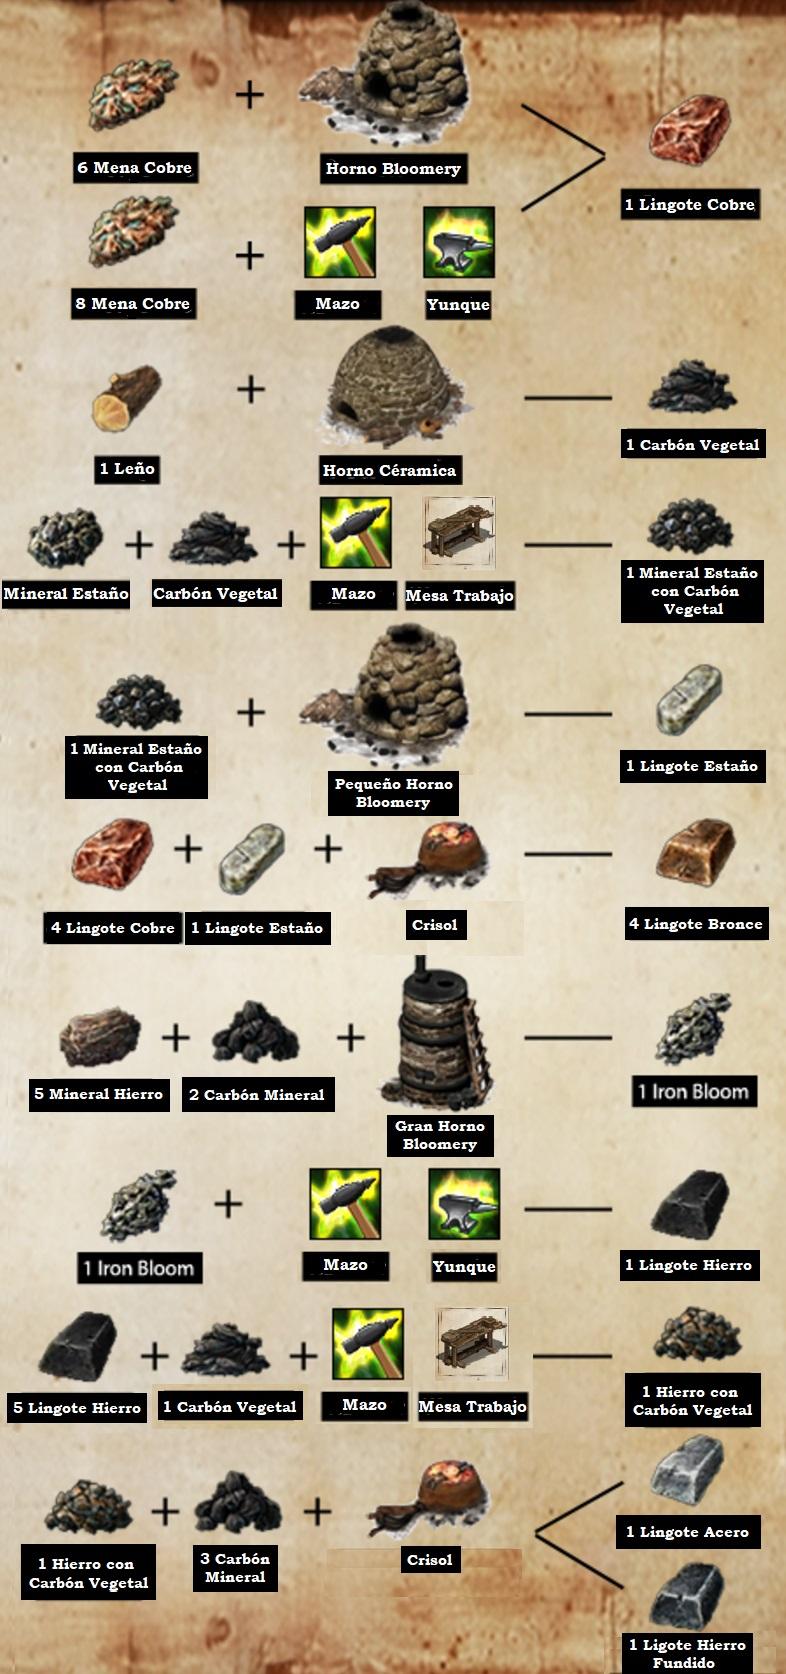 0_1502506637440_Fabricar Minerales.jpg